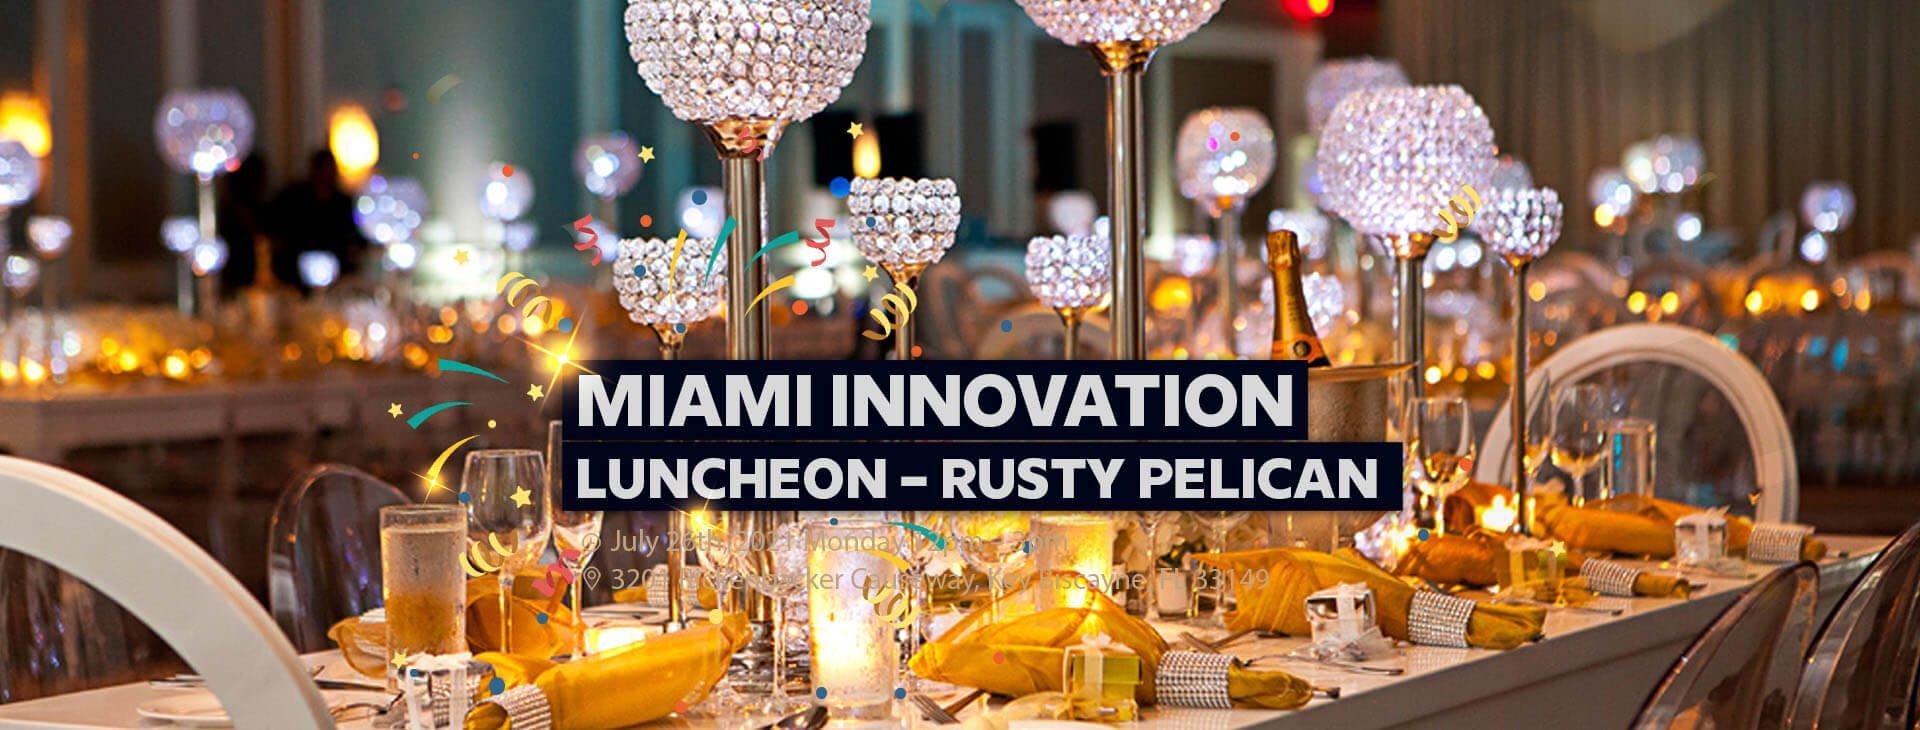 Miami Innovation Luncheon – Rusty Pelican